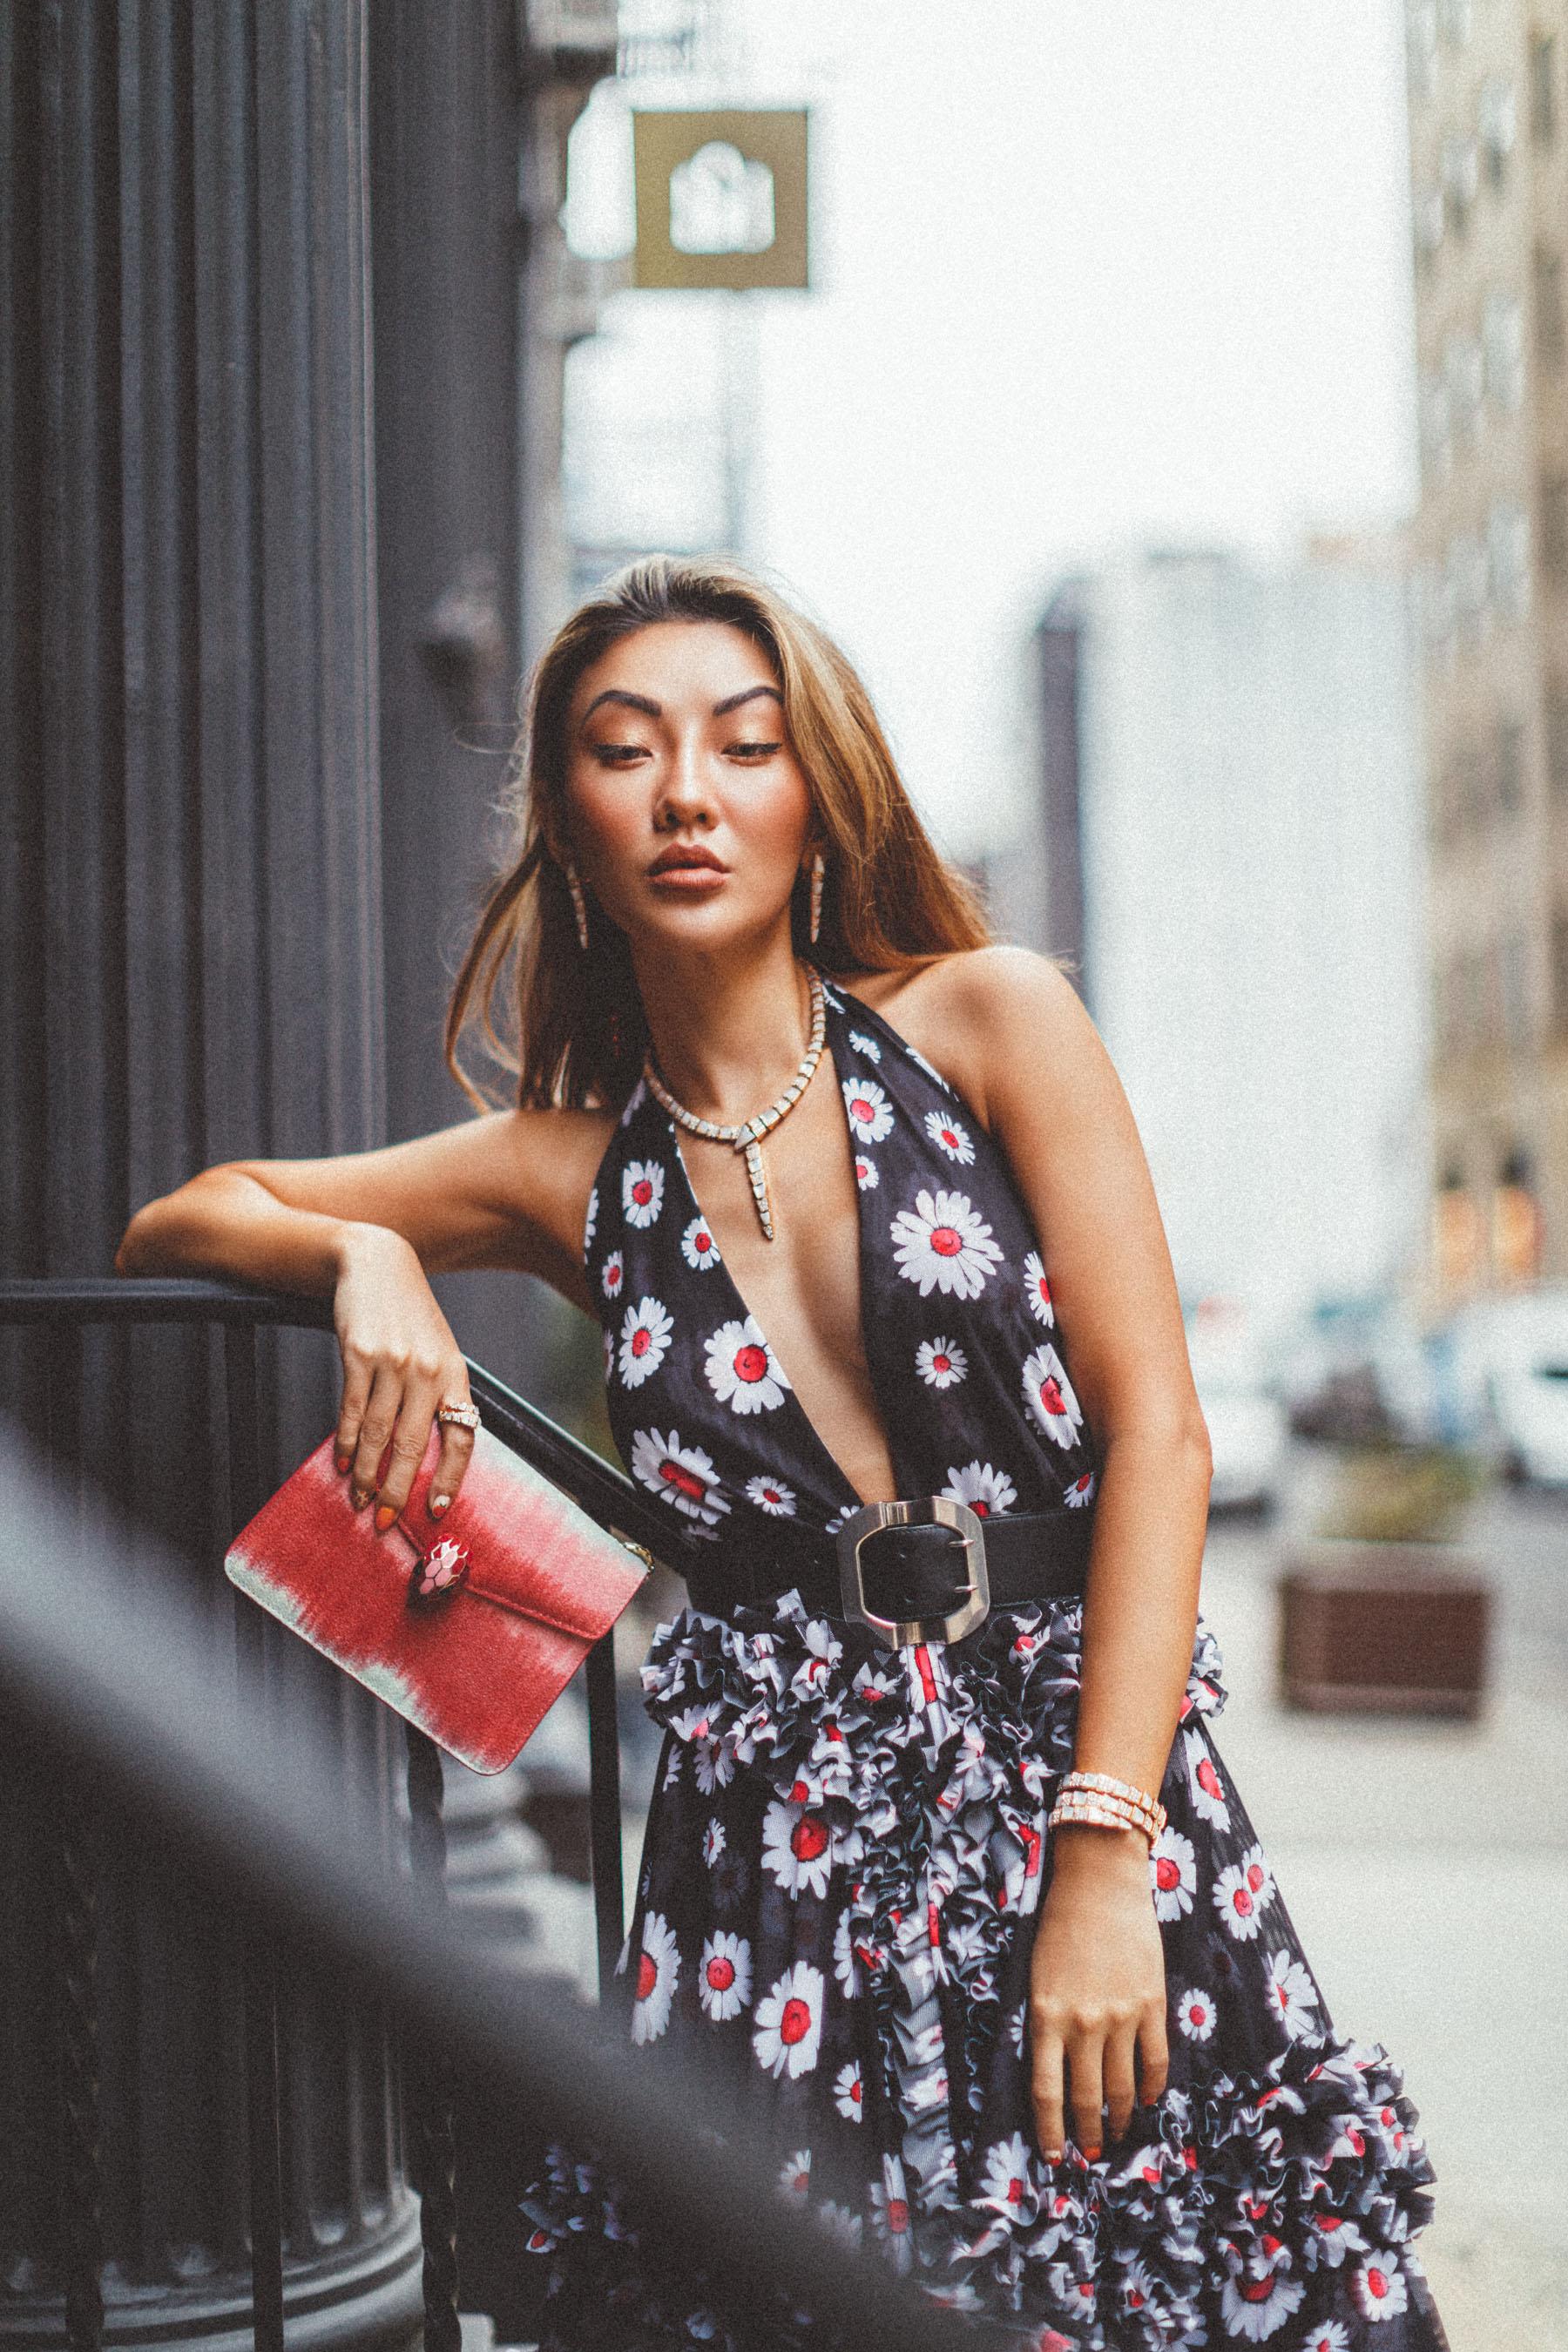 plunging neckline printed dress, waist belt, favorite french fashion brands // Notjessfashion.com